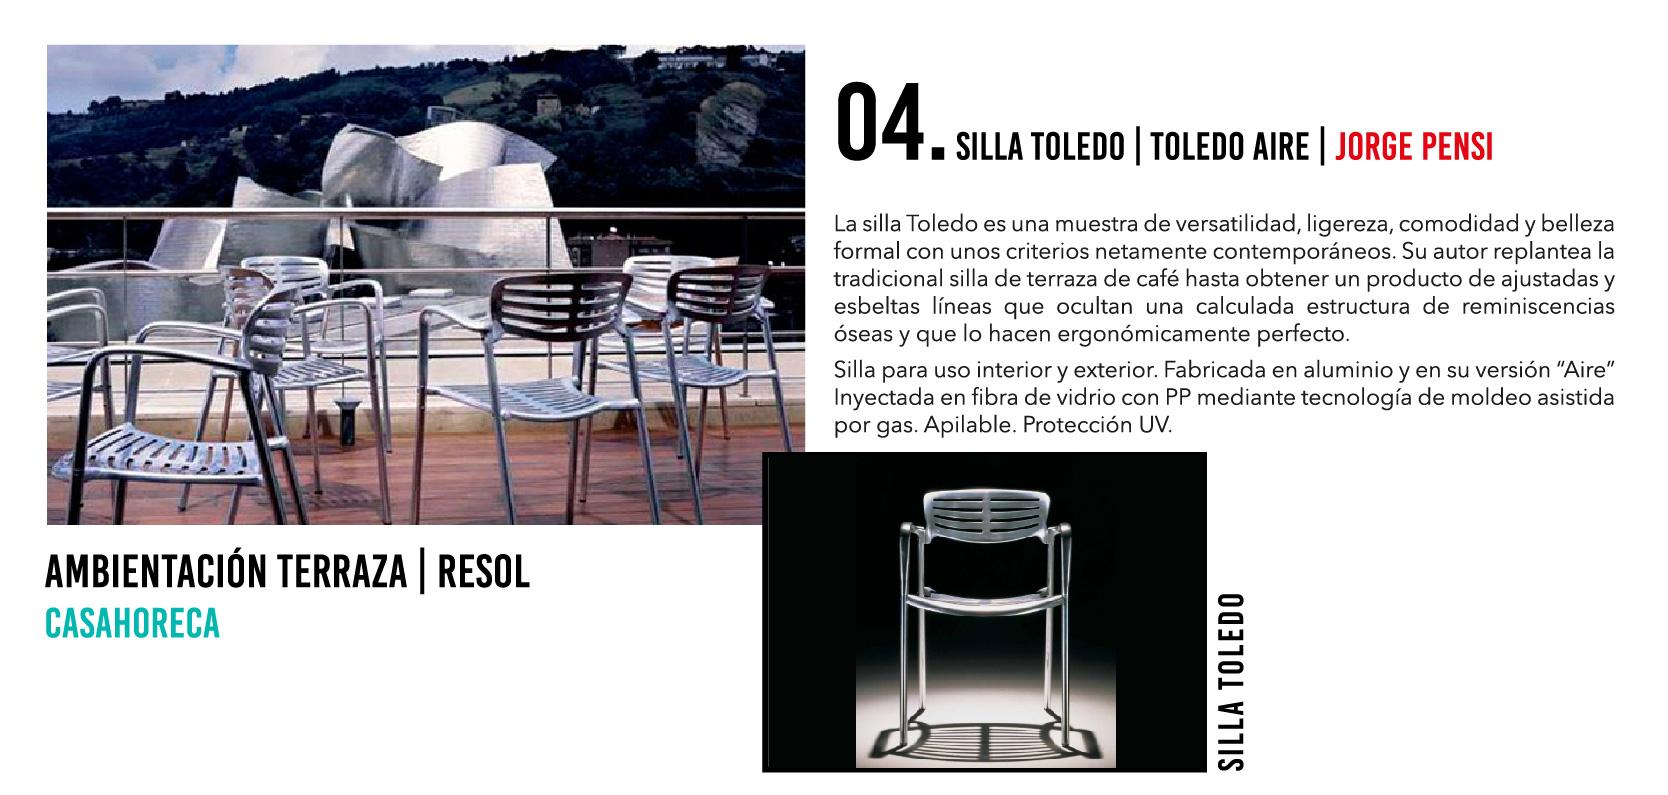 Silla Toledo - Casahoreca.com